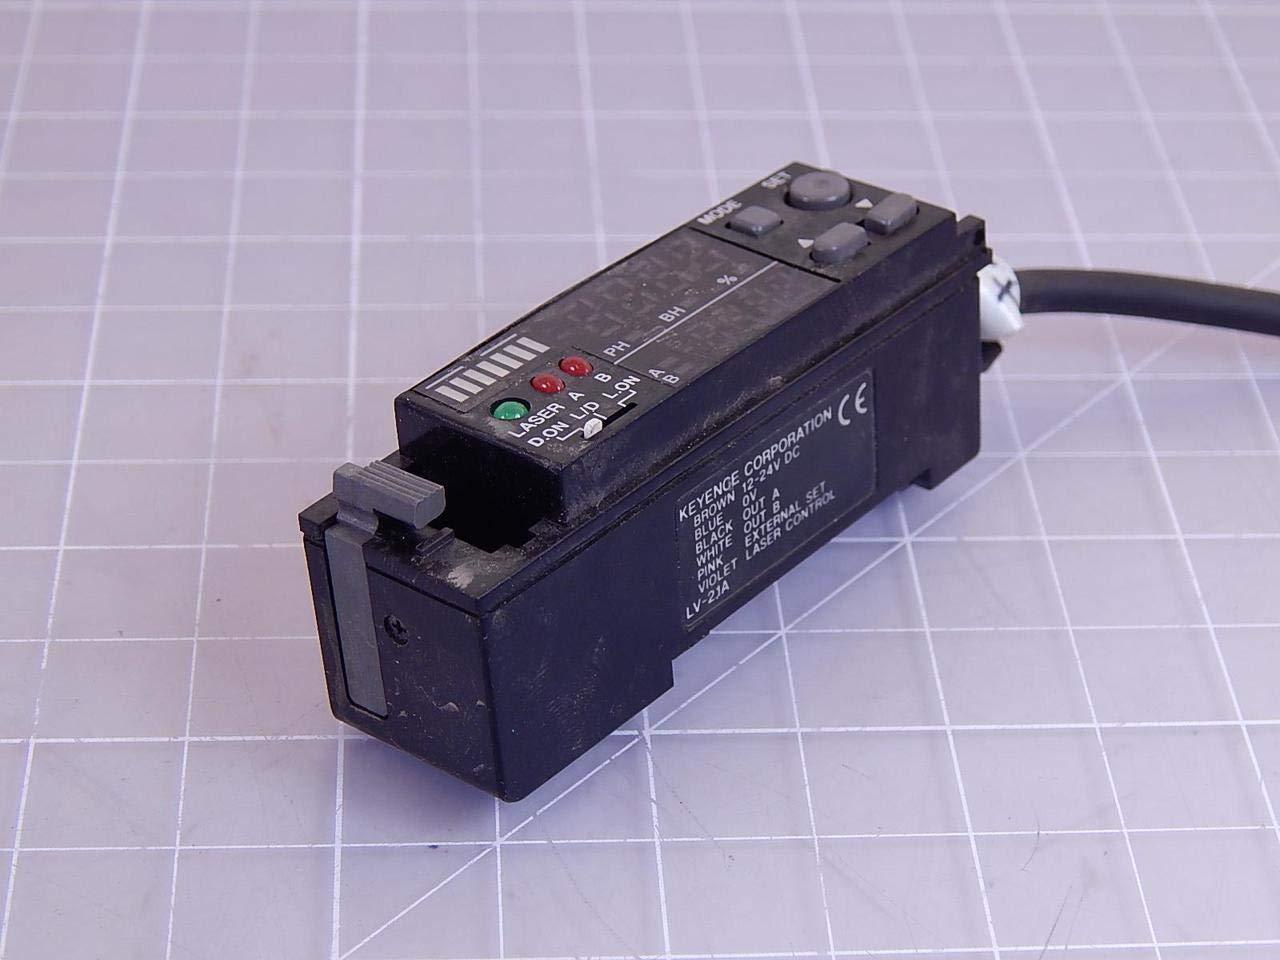 KEYENCE LV-21A Digital Laser Sensor Amplifier Display 12-24VDC T12338: Mechanical Component Equipment Cases: Amazon.com: Industrial & Scientific